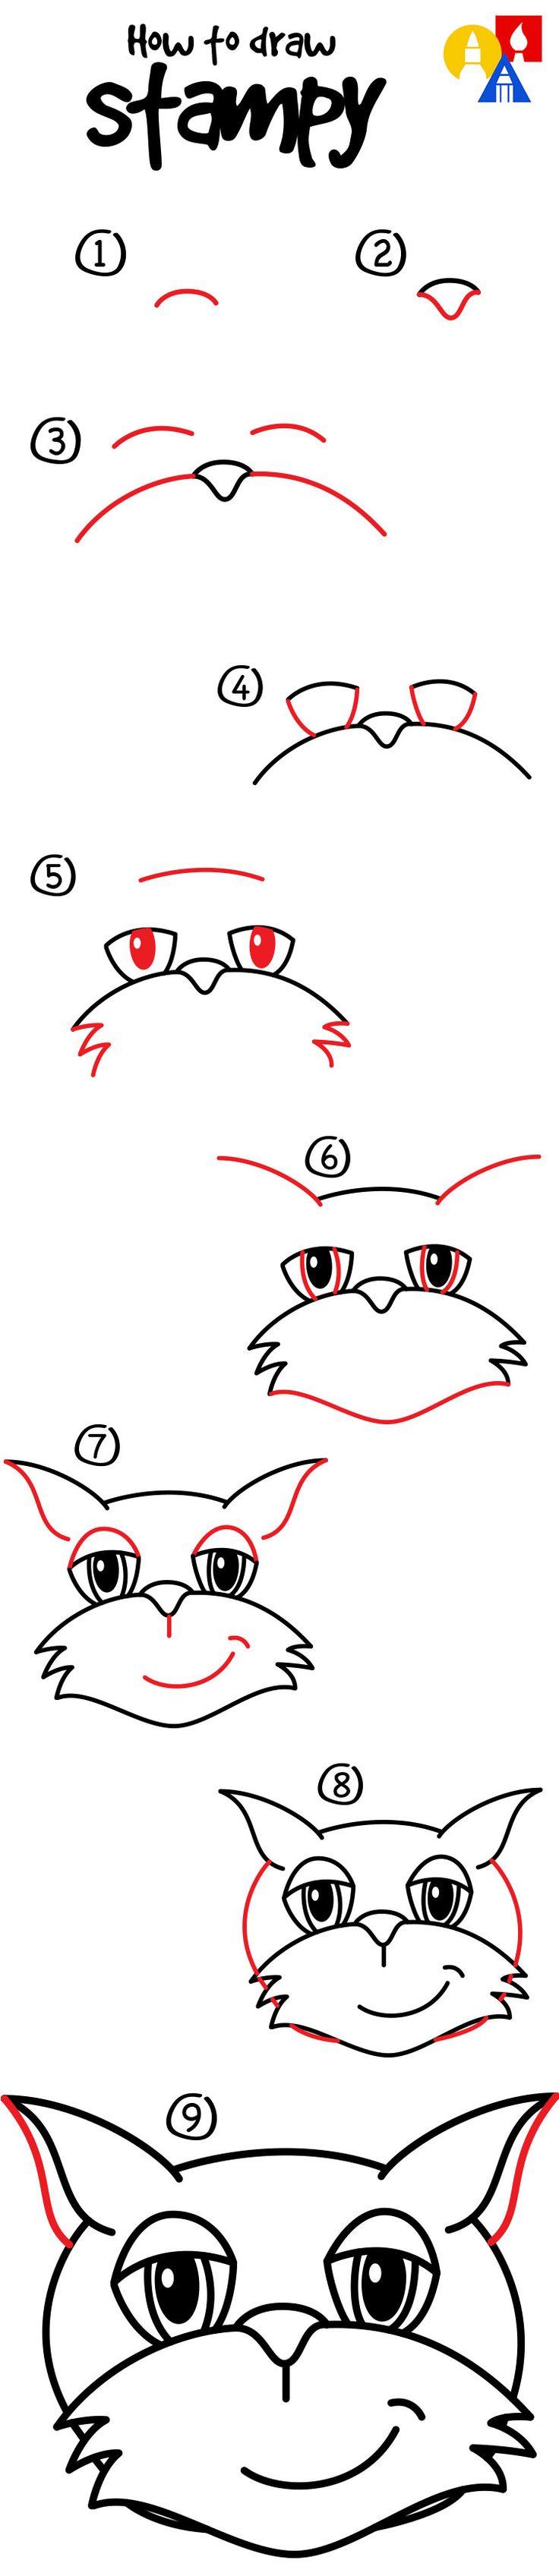 how to draw minecraft step by step